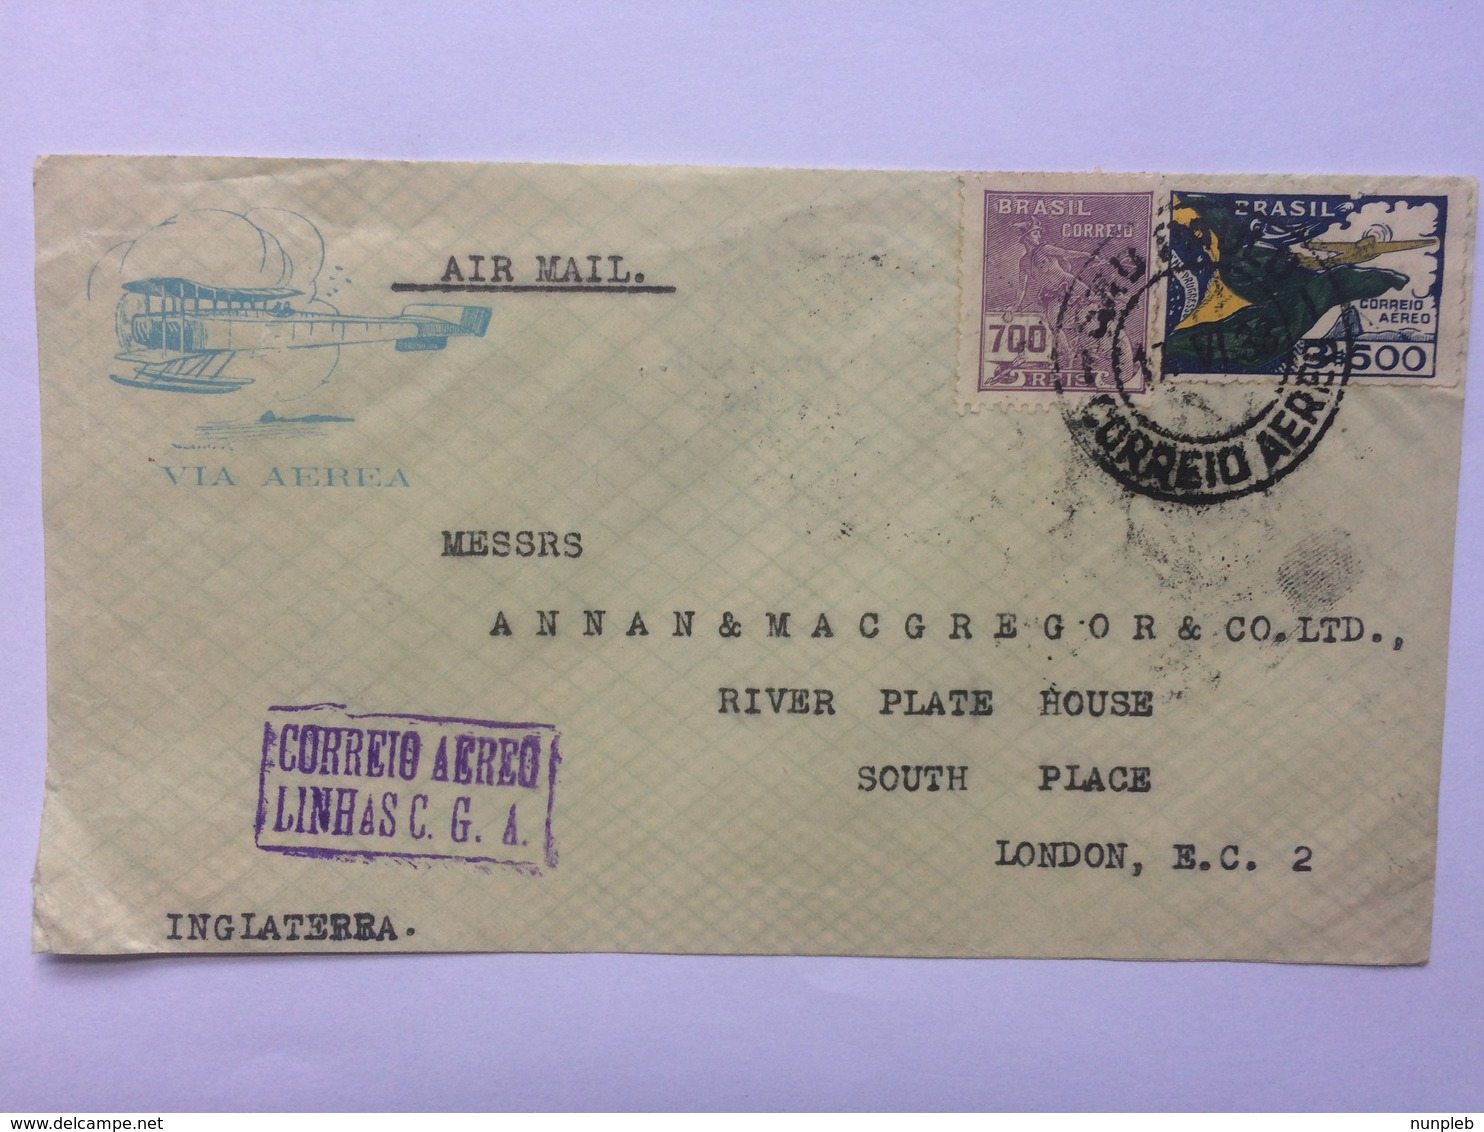 BRAZIL 1933 Air Mail Cover Sao Paulo To England - Aeroplane Cachet And Correio Aereo Cachet - Brésil